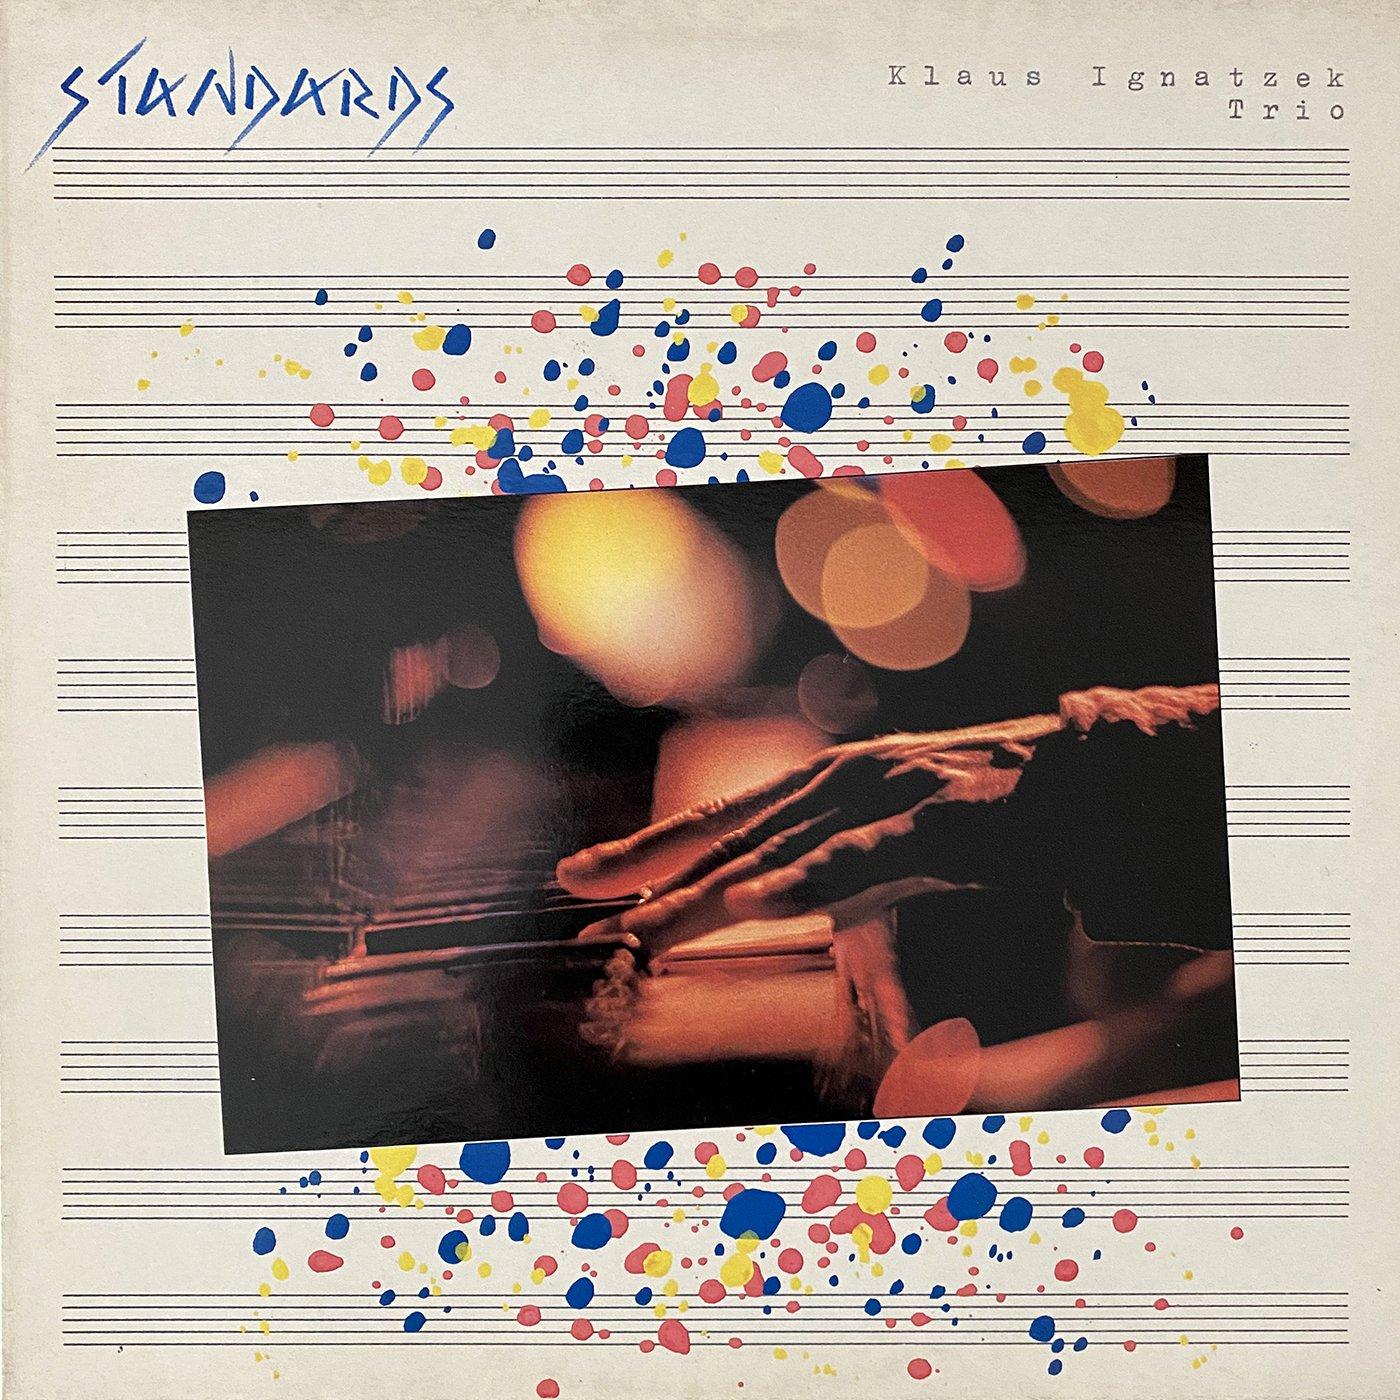 Standards - Klaus Ignatzek Trio